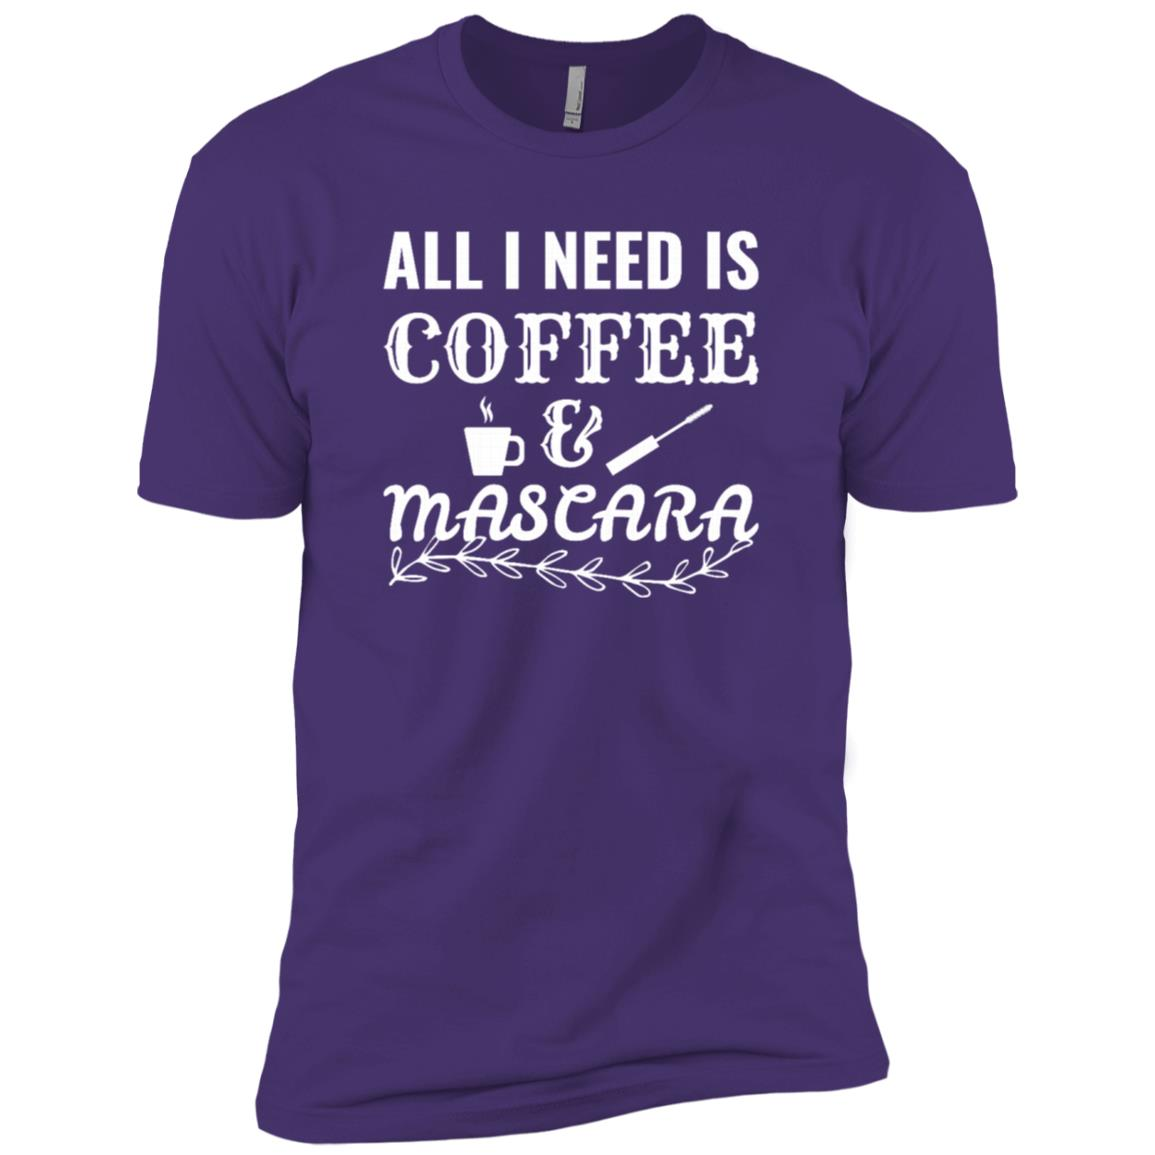 All I Need is Coffee & Mascara Eyelashes Makeup Men Short Sleeve T-Shirt